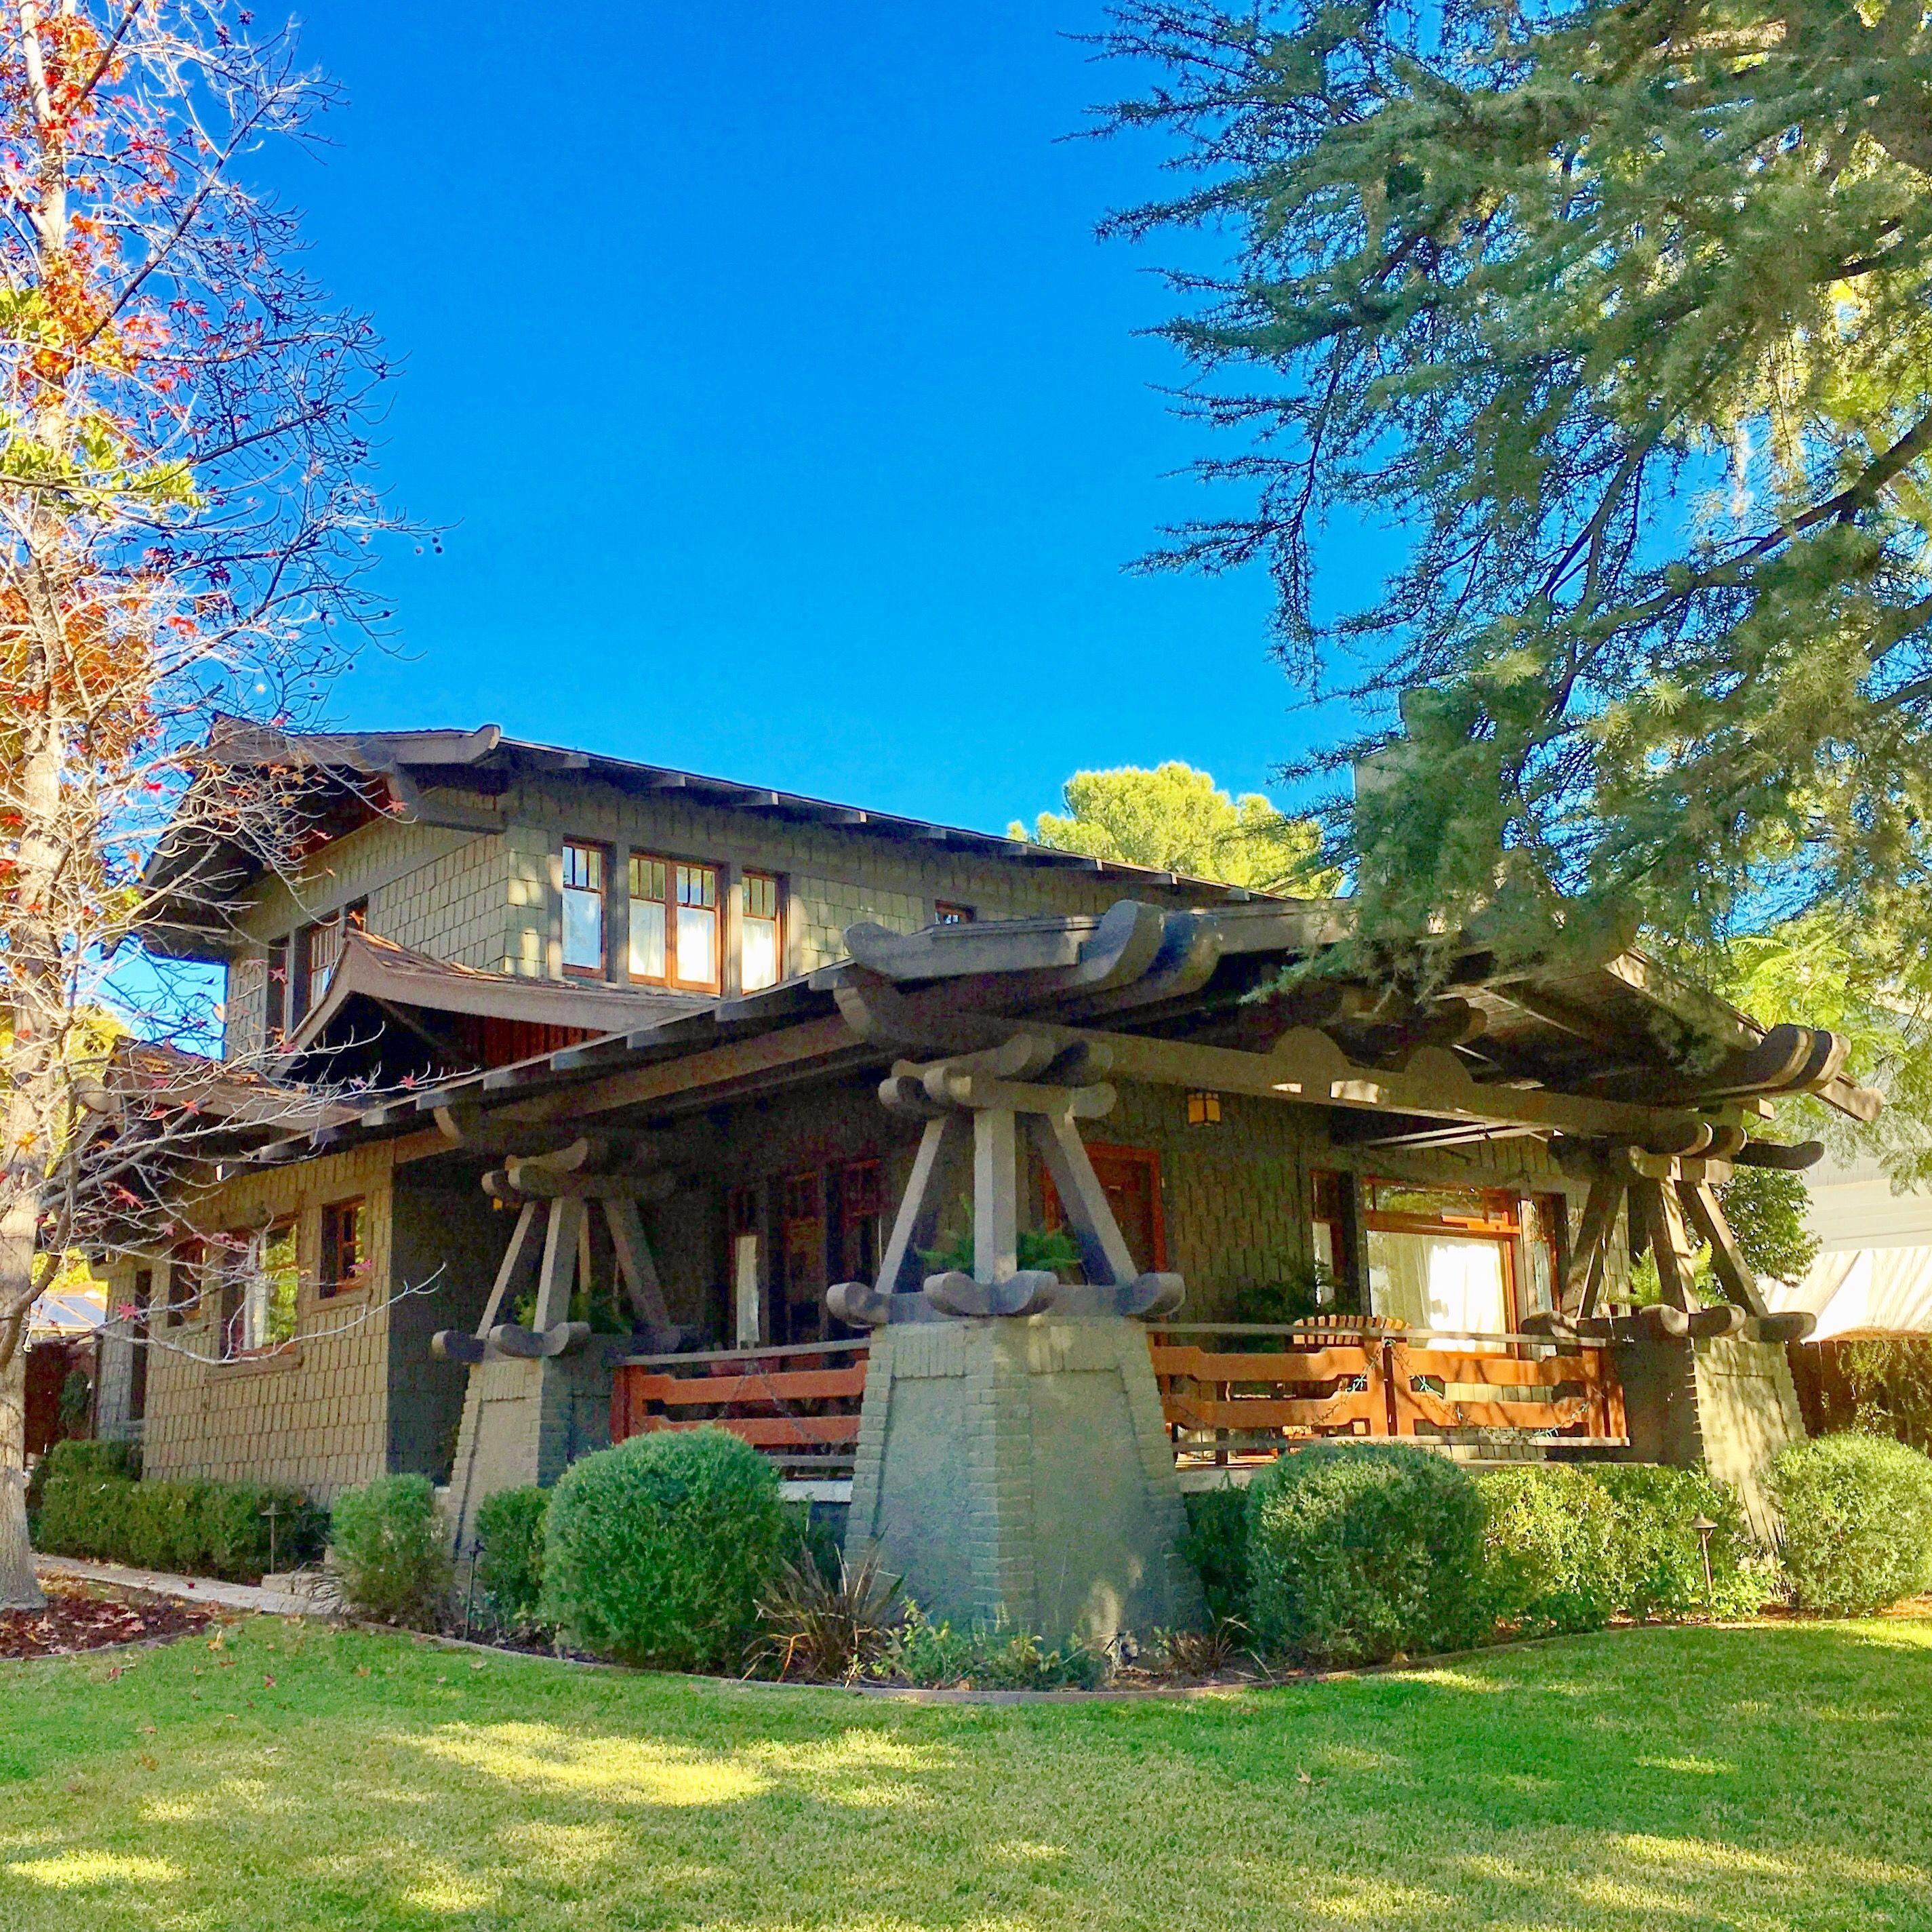 Arts and crafts home pasadena california home decor diy for Pasadena craftsman homes